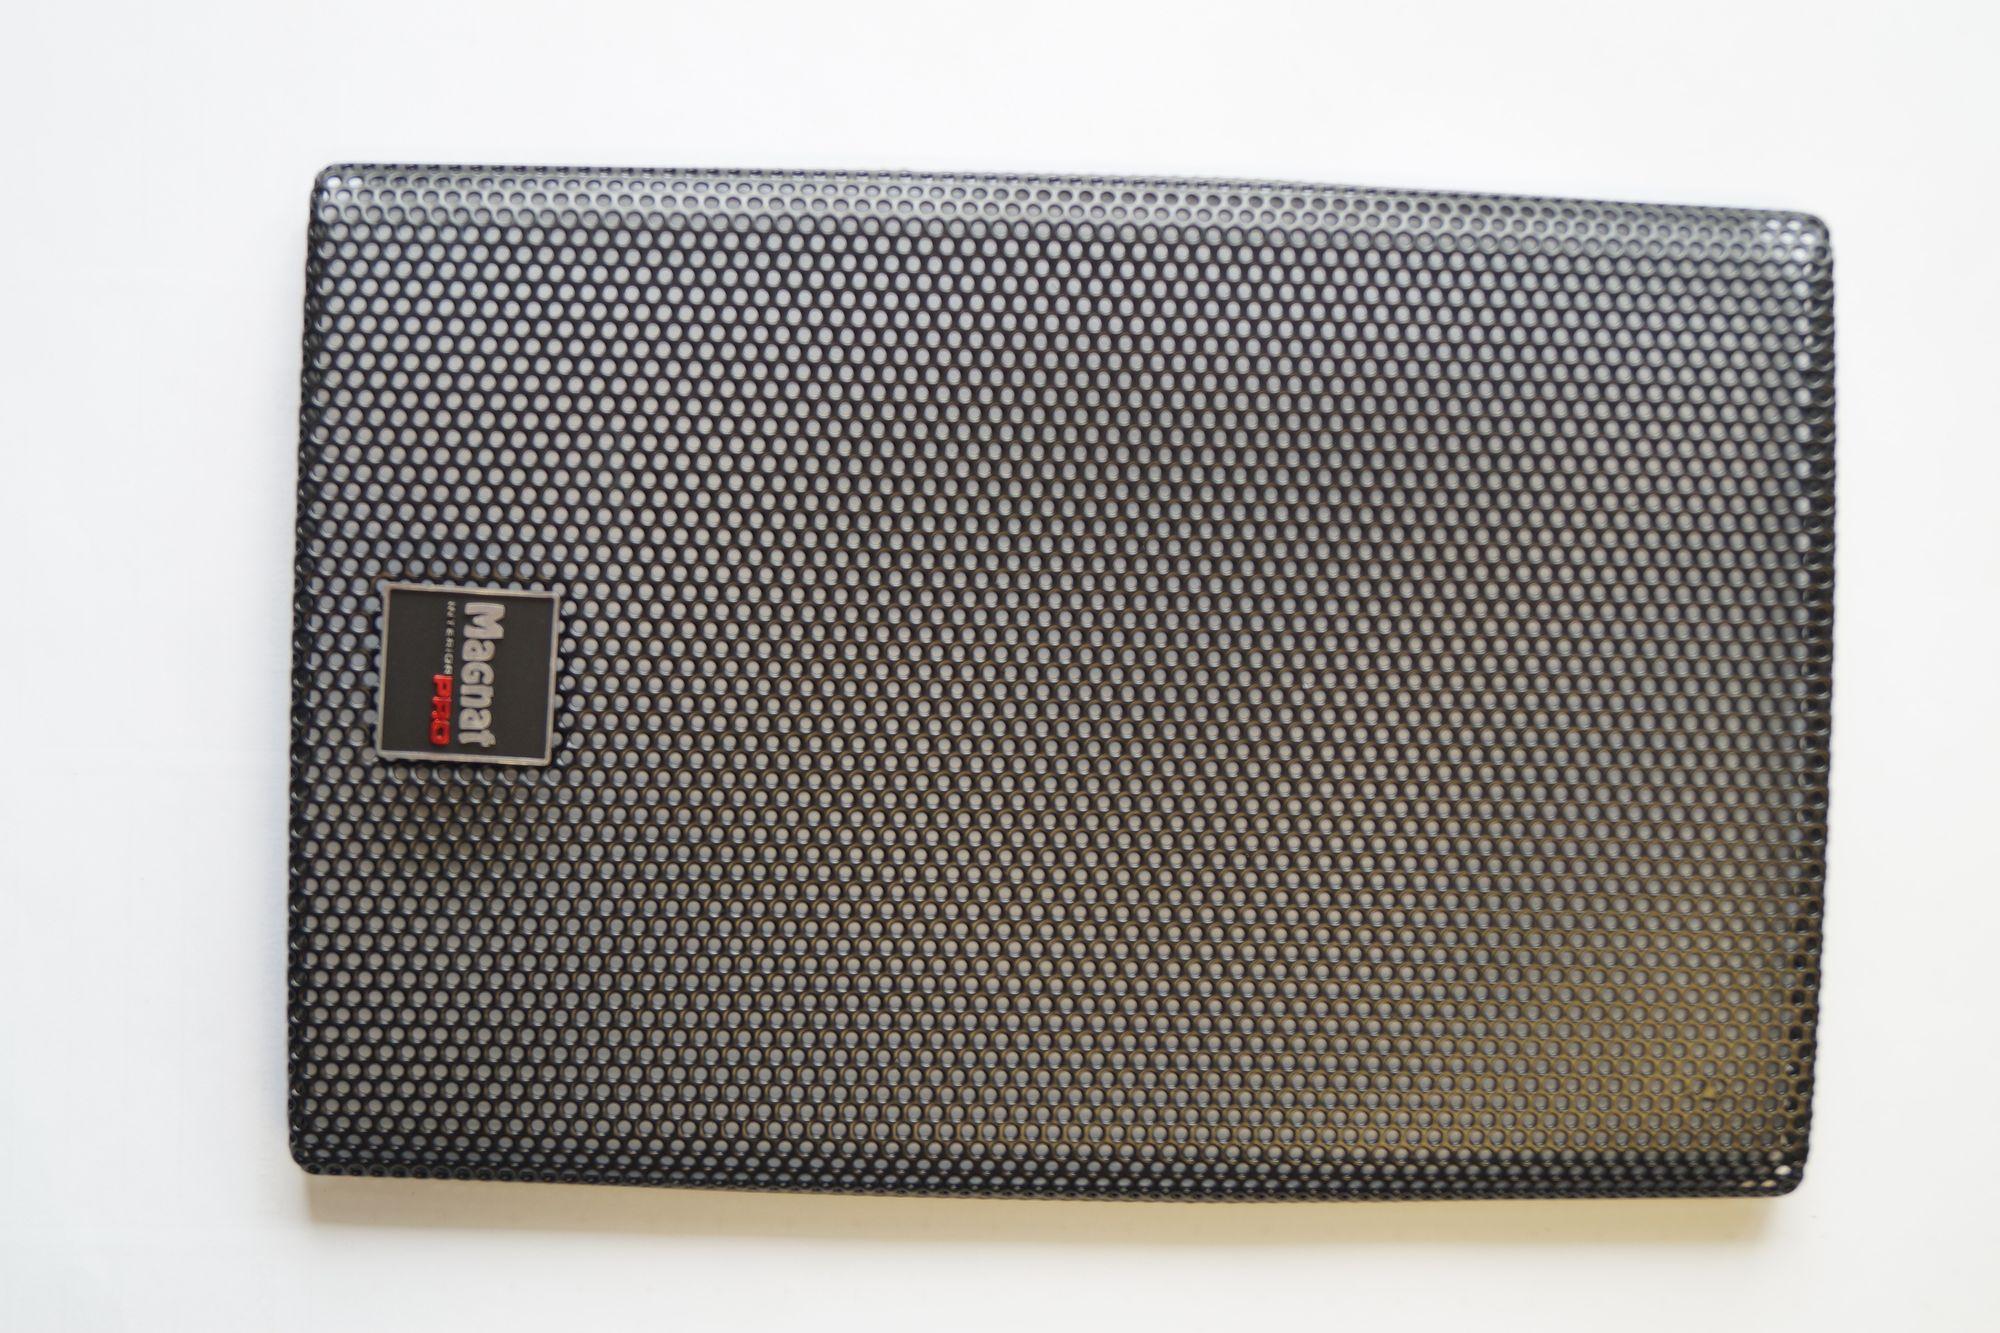 1 Stück Magnat Interior Pro Lautsprecherabdeckung schwarz Neu